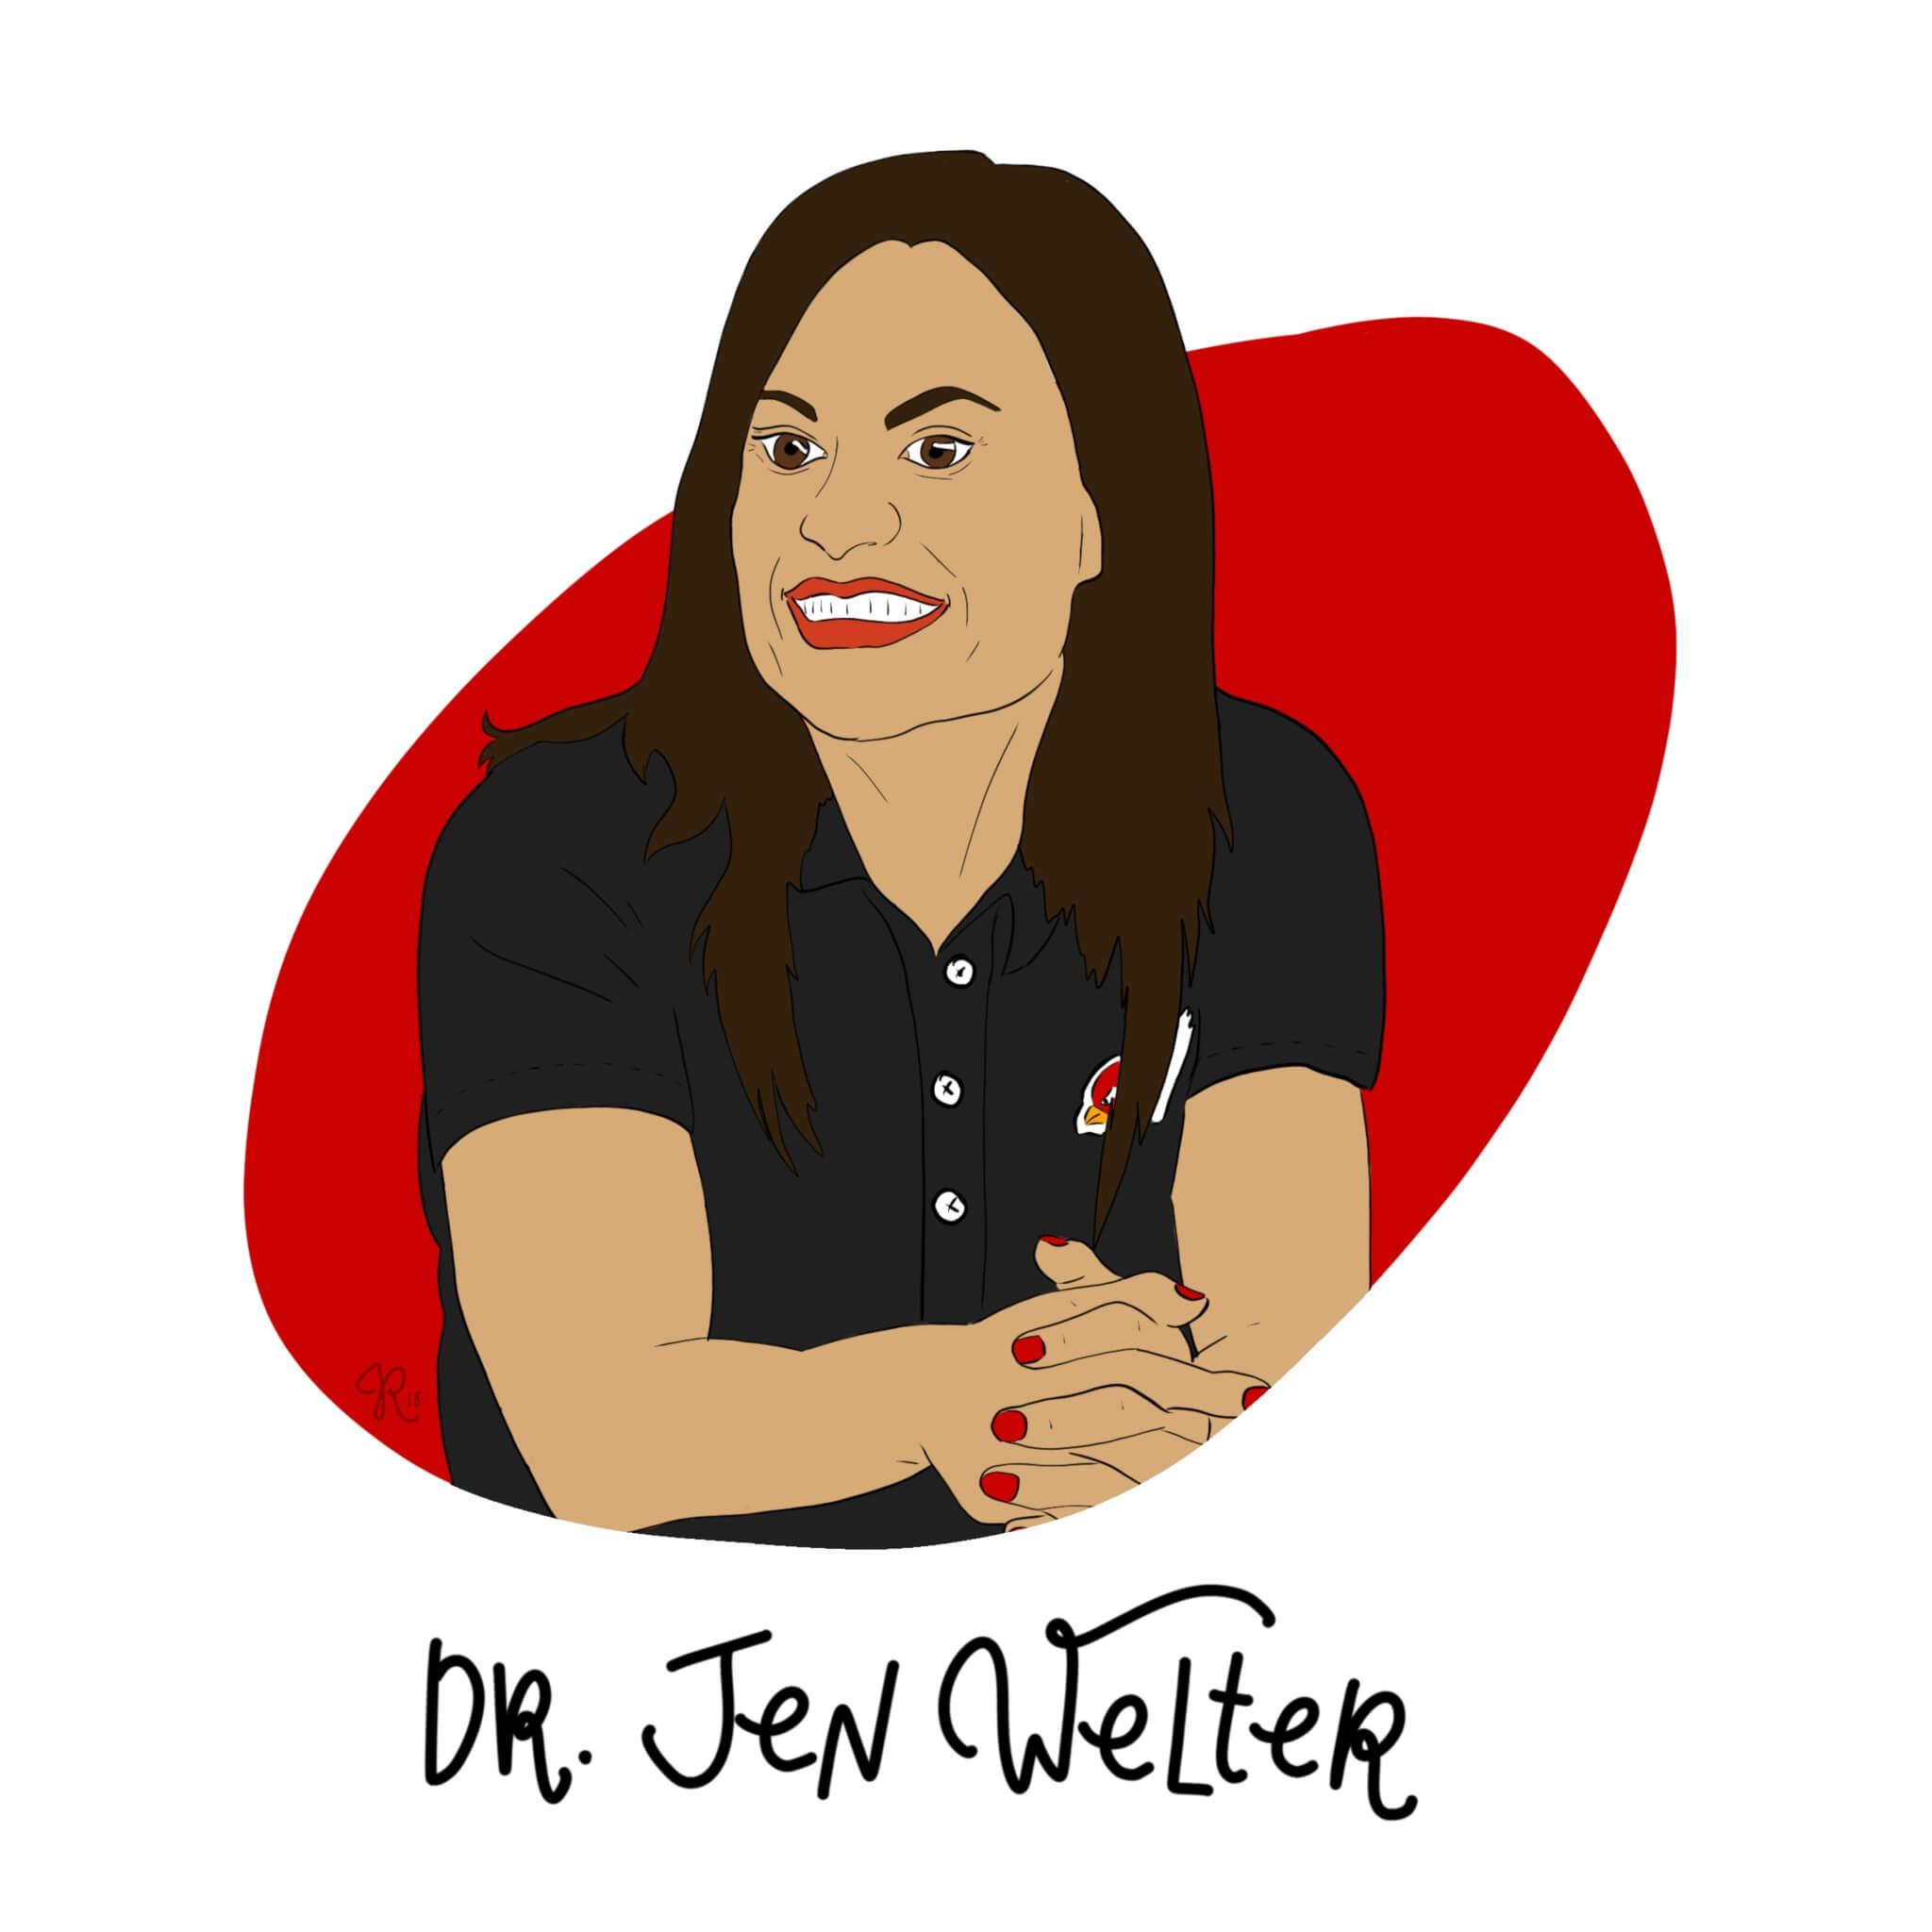 Dr. Jen Welter Illustration by Jessica Ringelstein